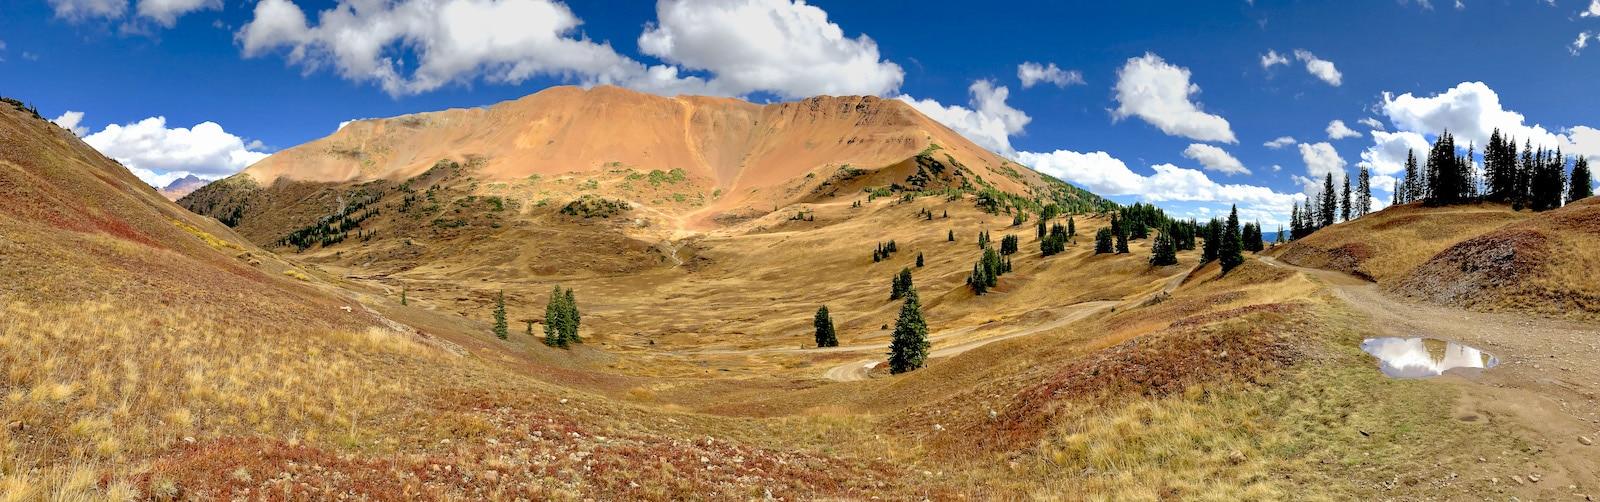 Mt Baldy Paradise Divide Colorado